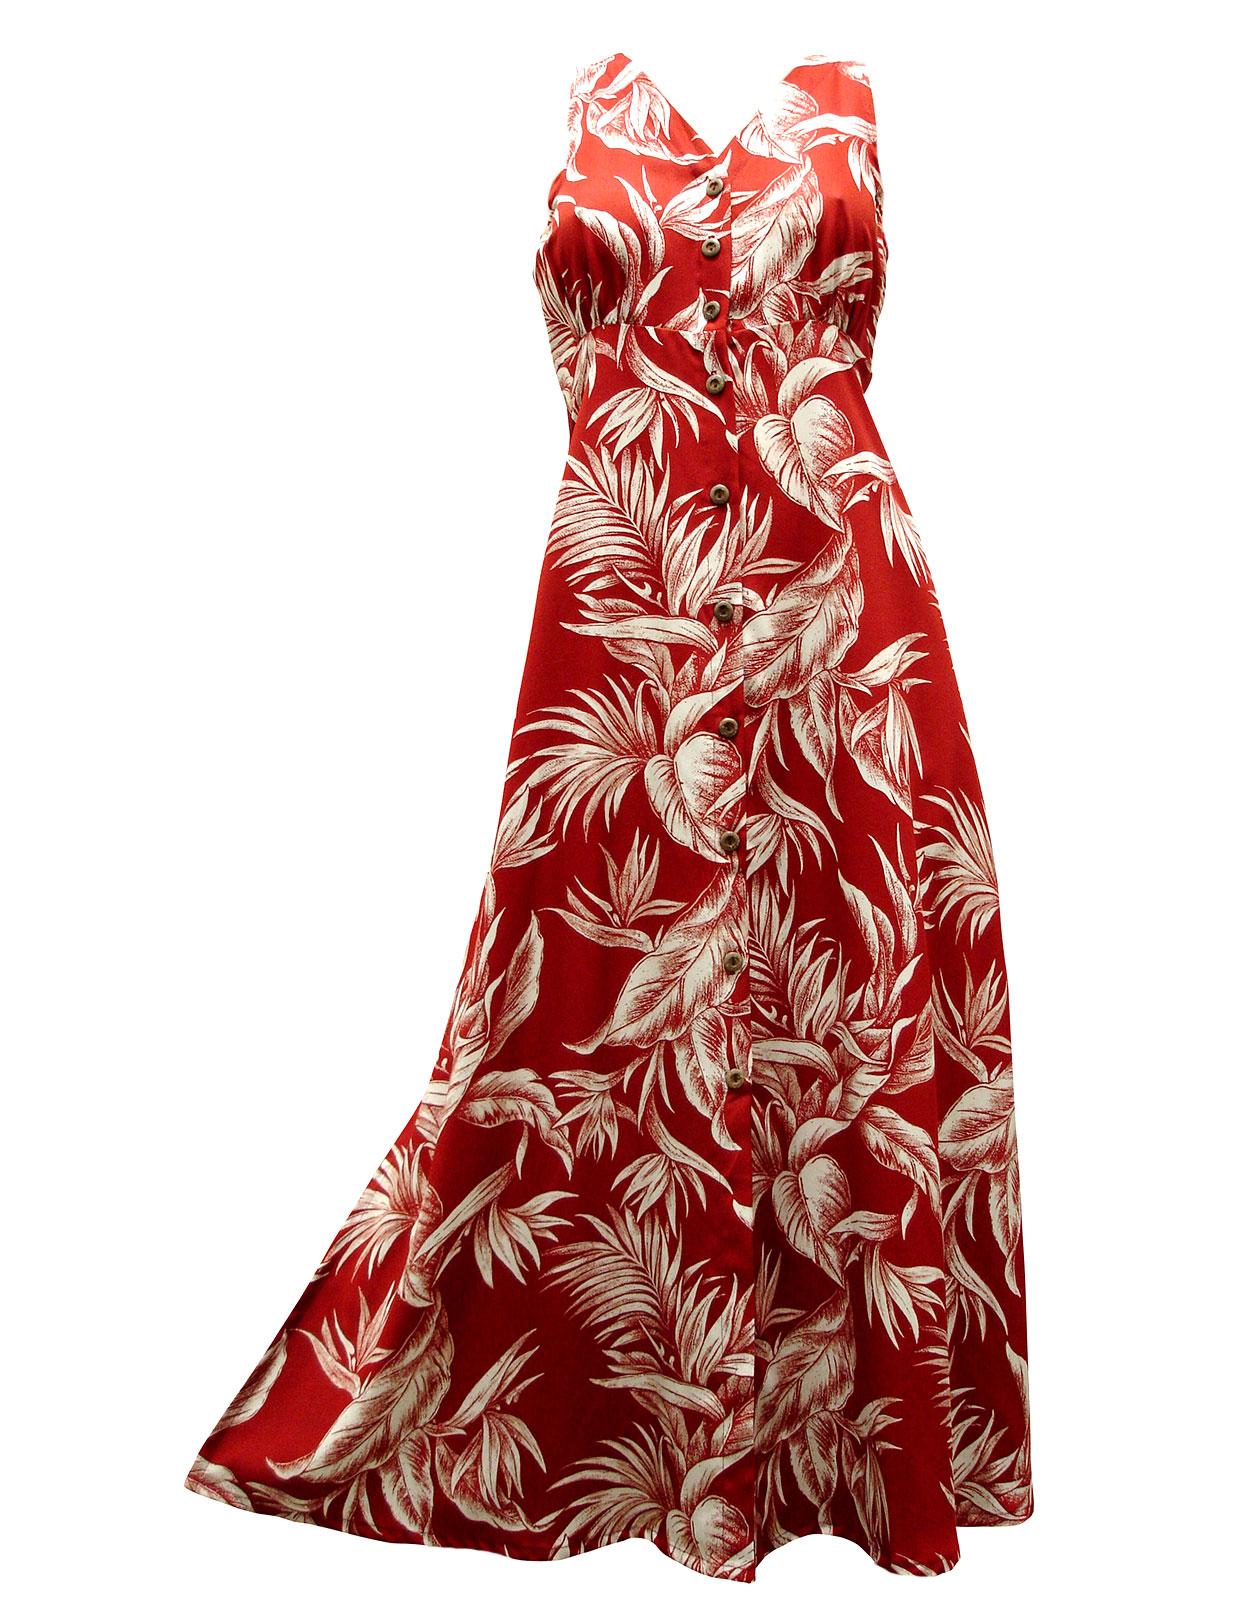 Long Hawaiian Dresses - Shaka Time Hawaii Clothing Store